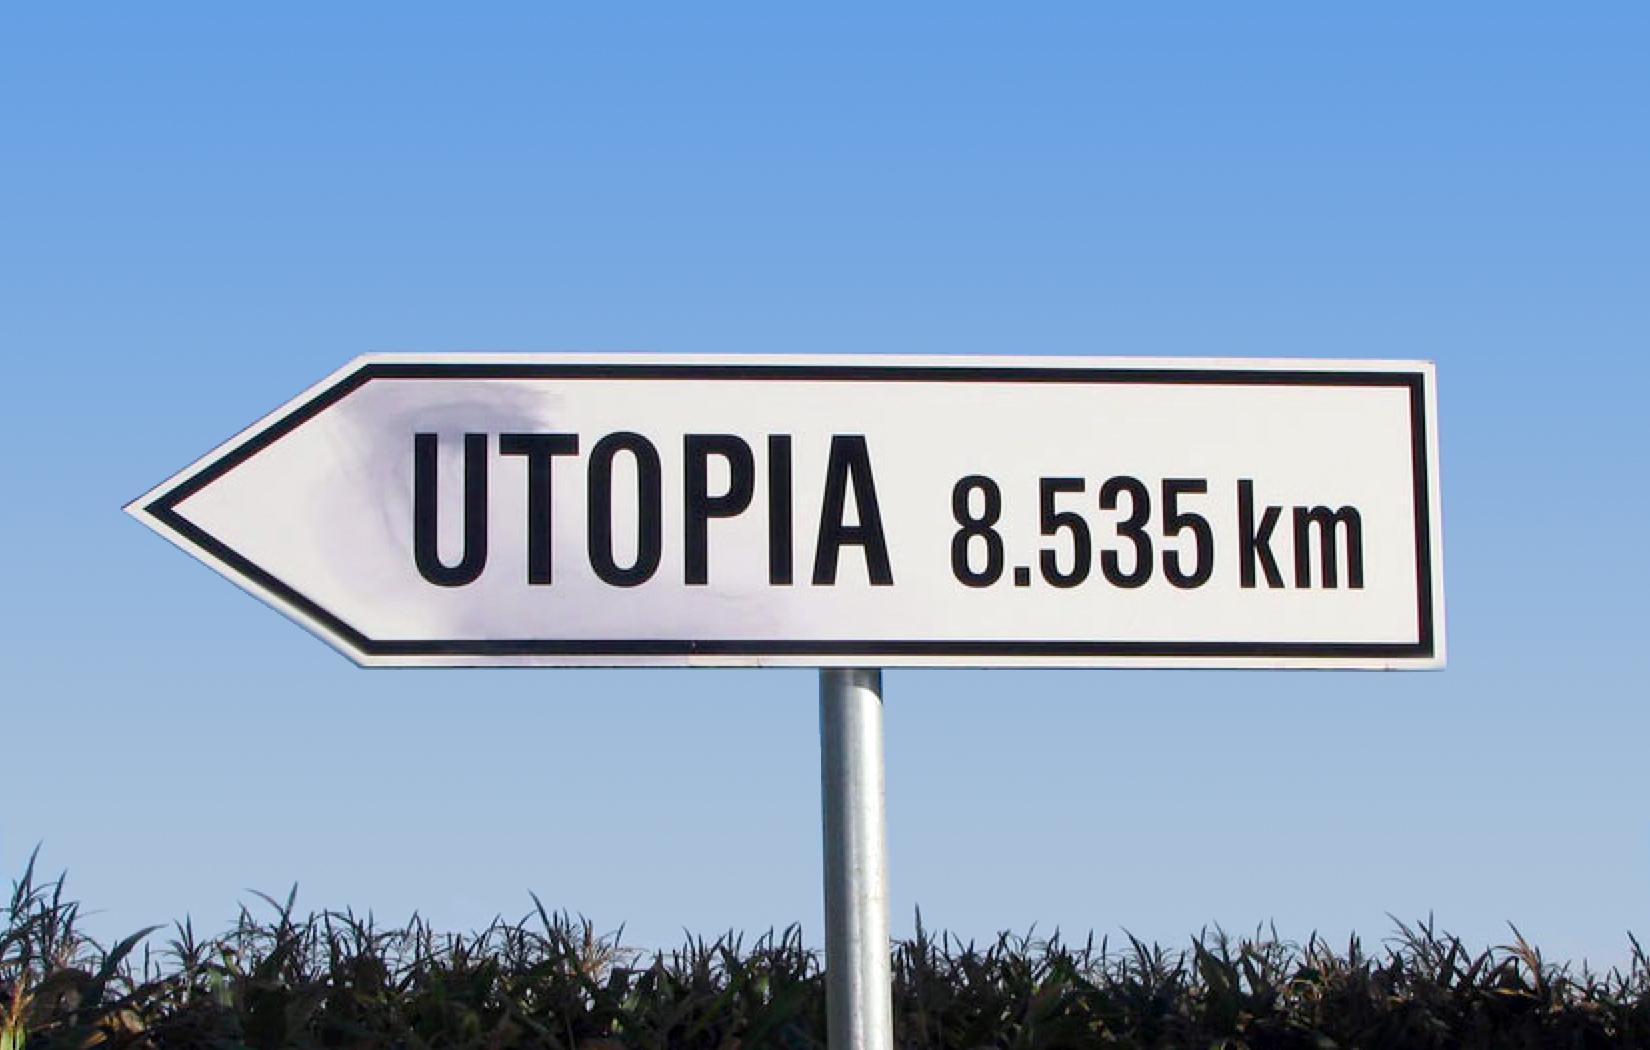 utopia roadsign.jpg